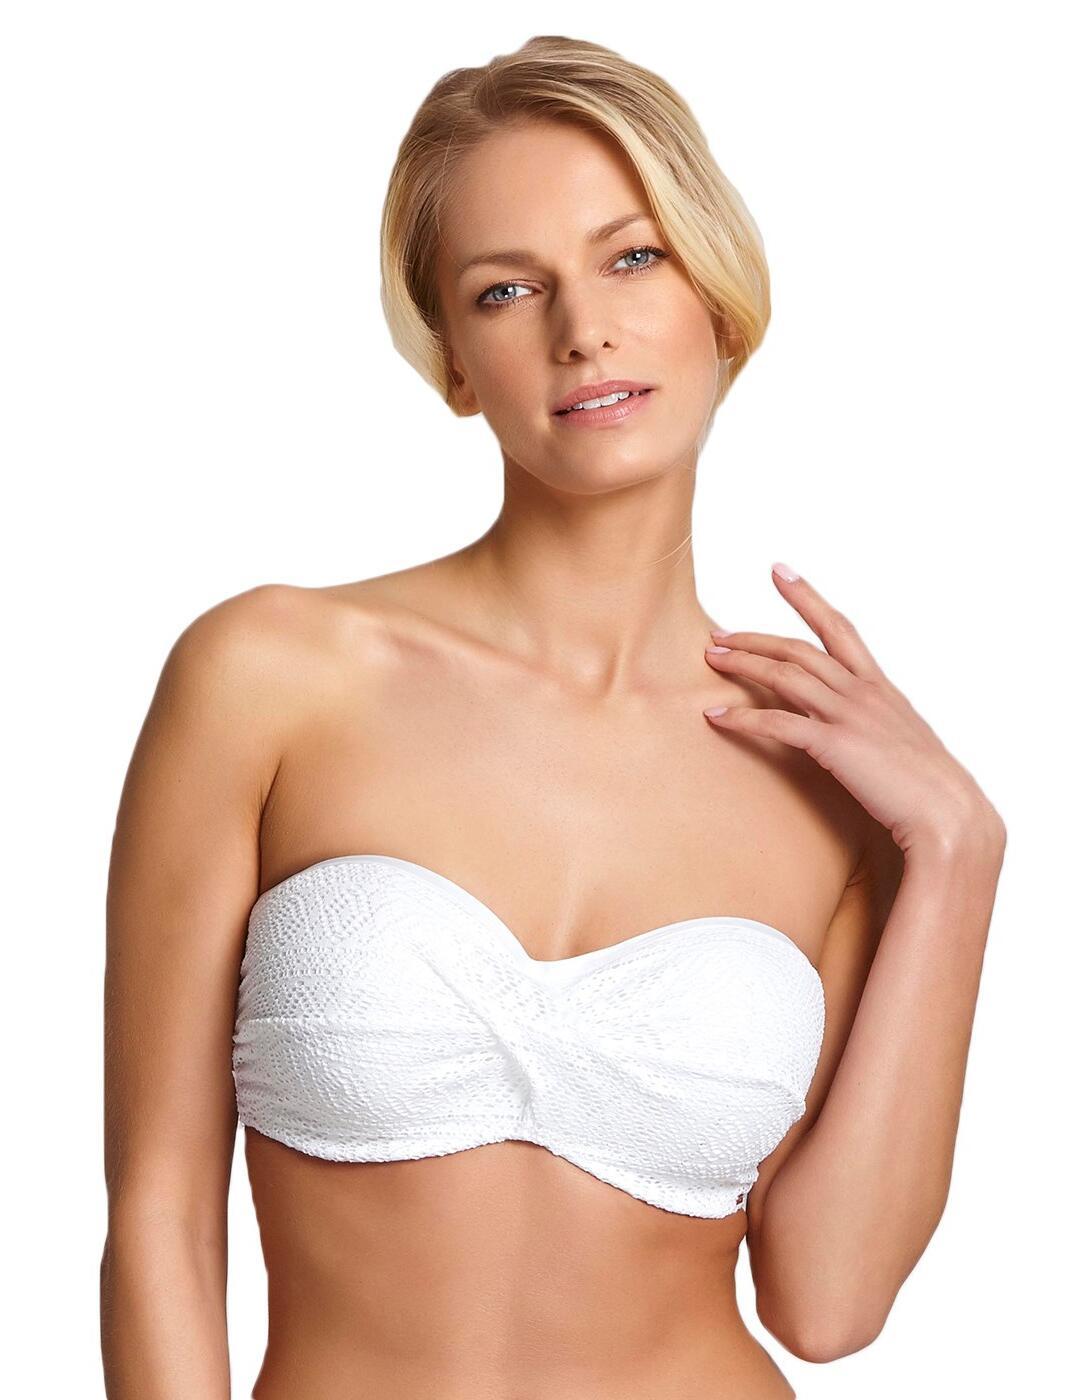 SW1253 Panache Anya Crochet Padded Bandeau Bikini Top - SW1253 White